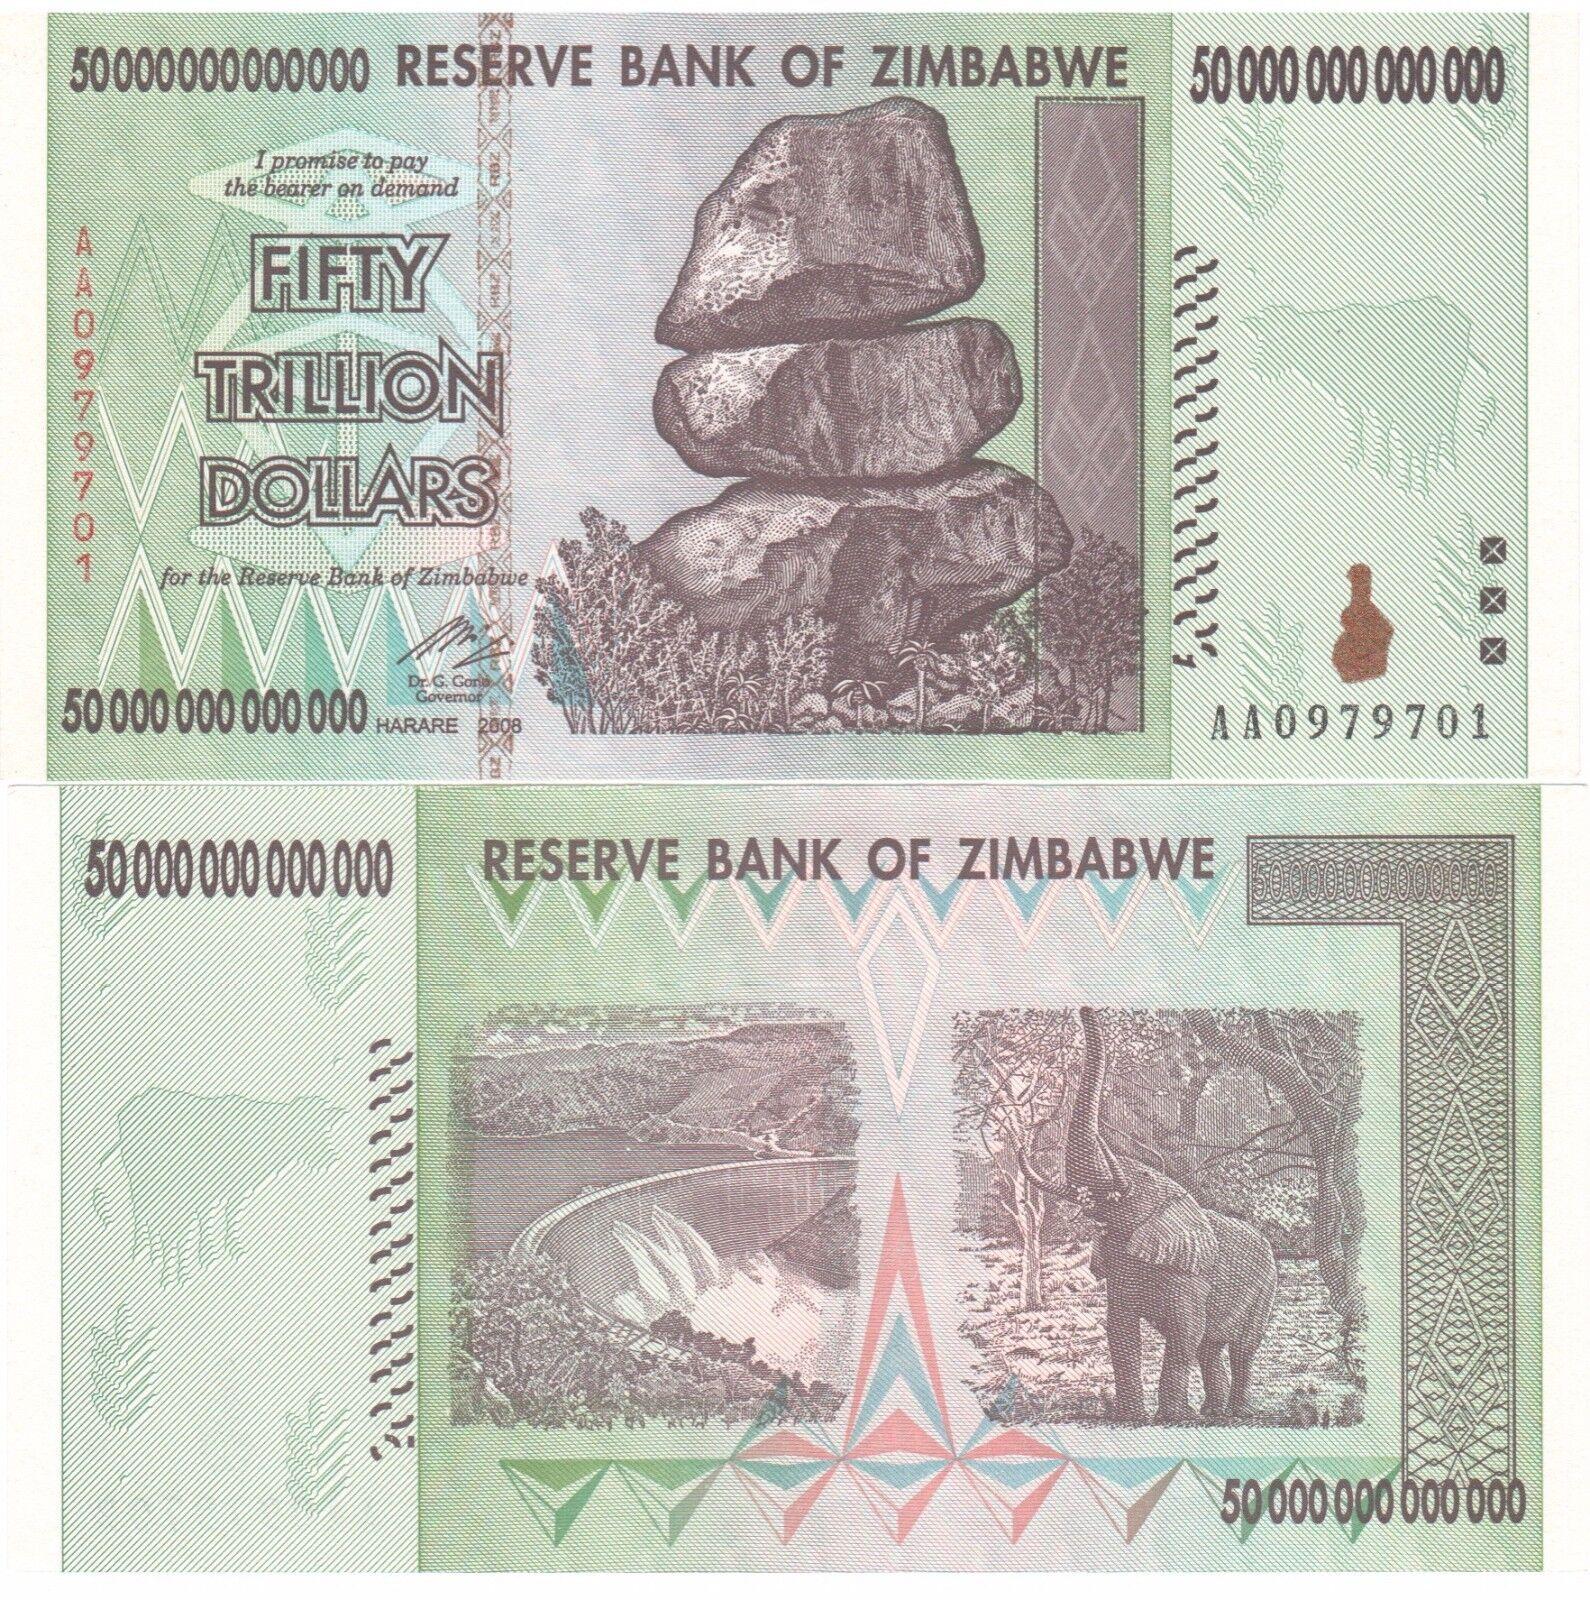 Купить 2 X ZIMBABWE 50 TRILLION DOLLARS UNCIRCULATED AA/2008 SERIES = $100 Trillion